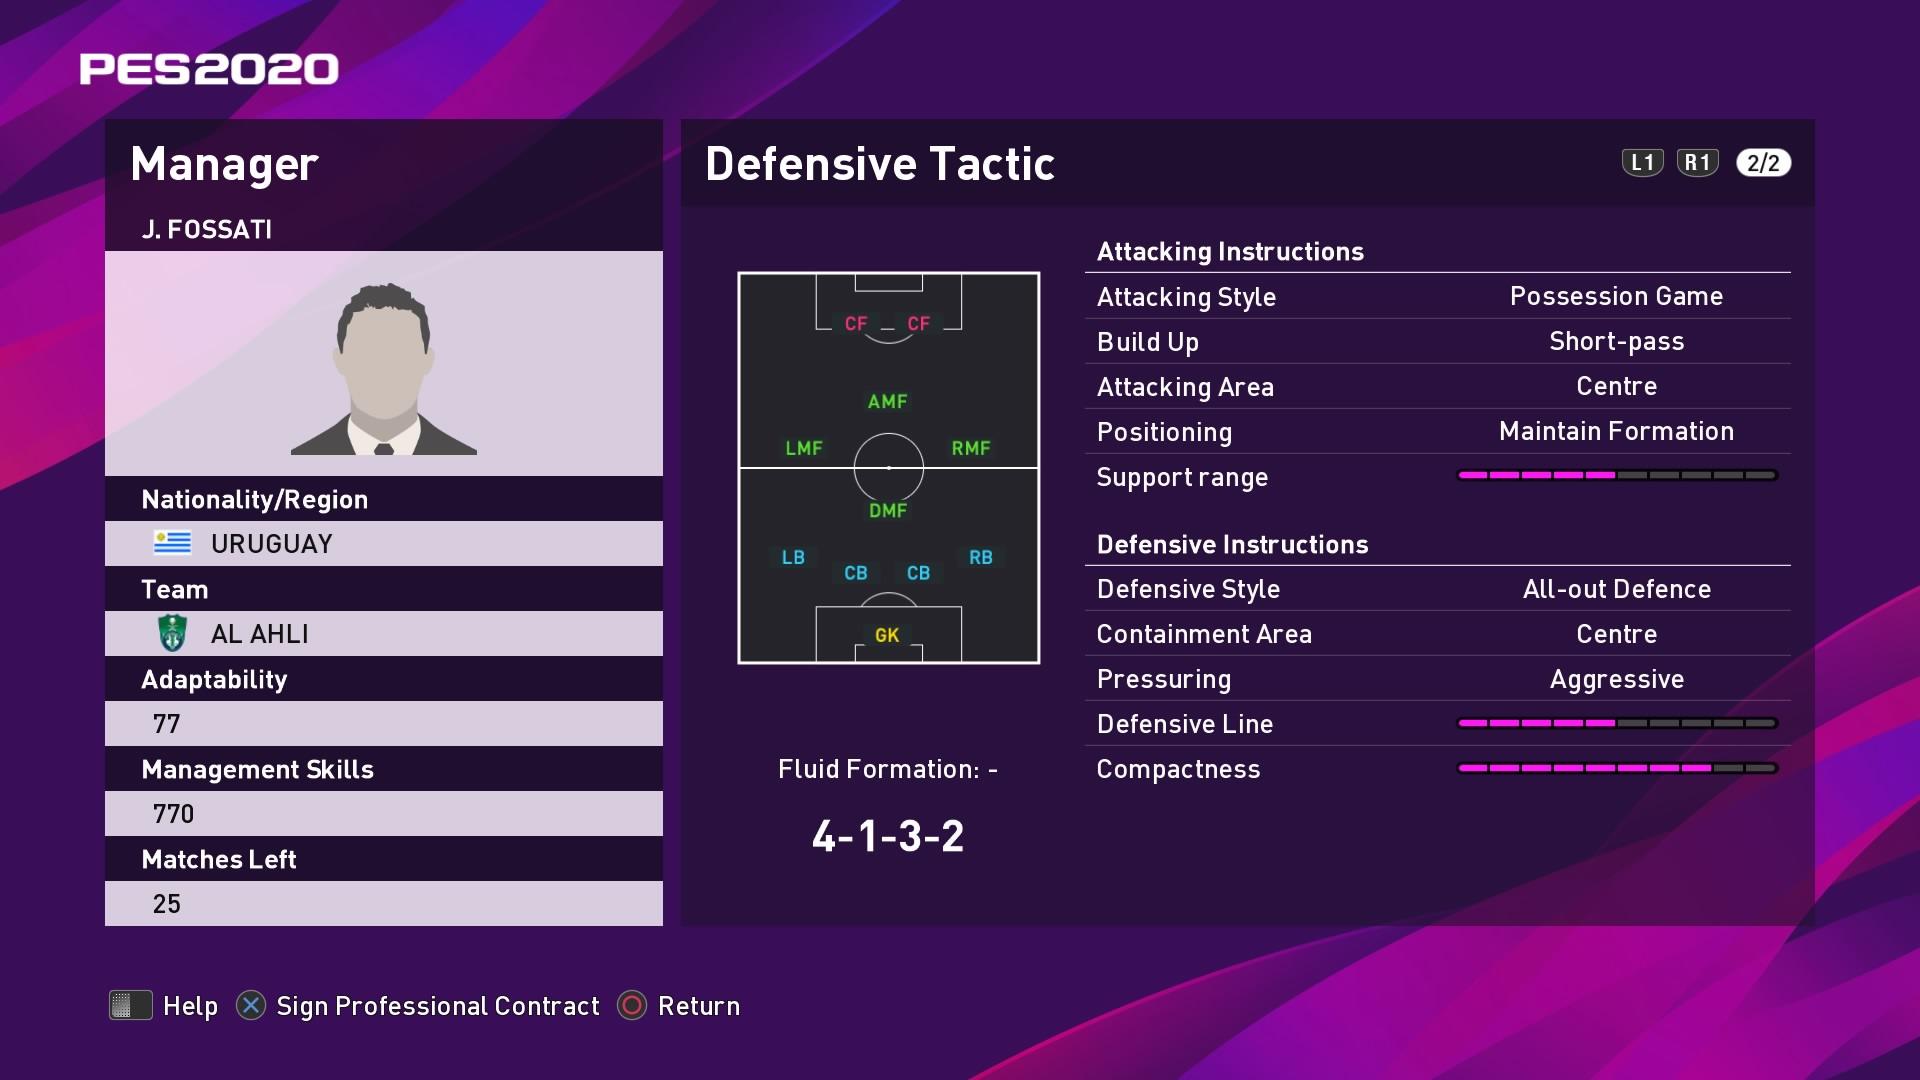 J. Fossati (Jorge Fossati) Defensive Tactic in PES 2020 myClub